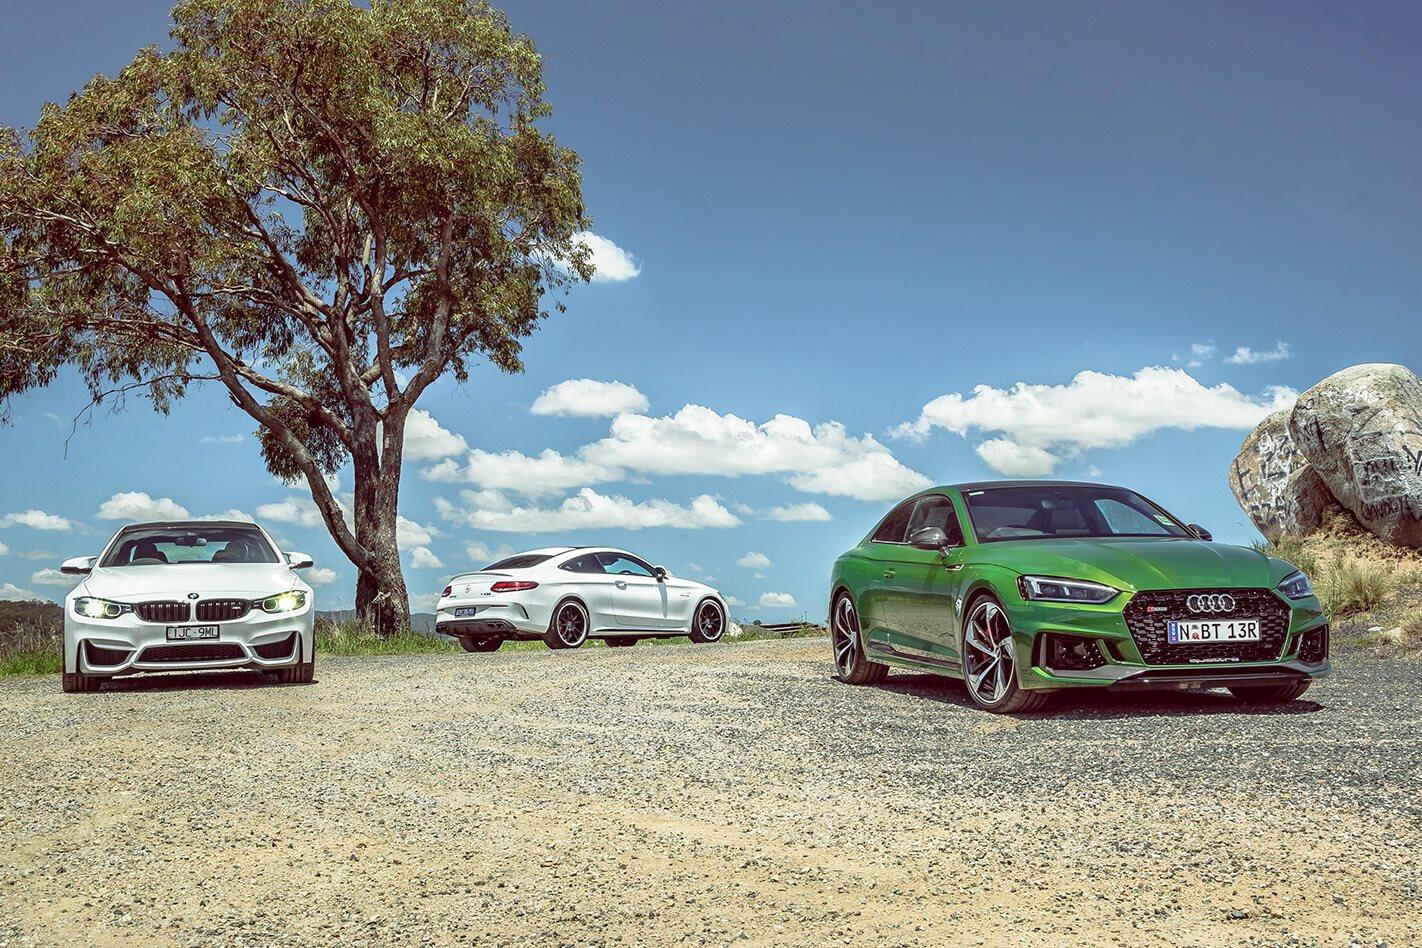 2018 Audi RS5 v BMW M4 Pure v Mercedes-AMG C63 S